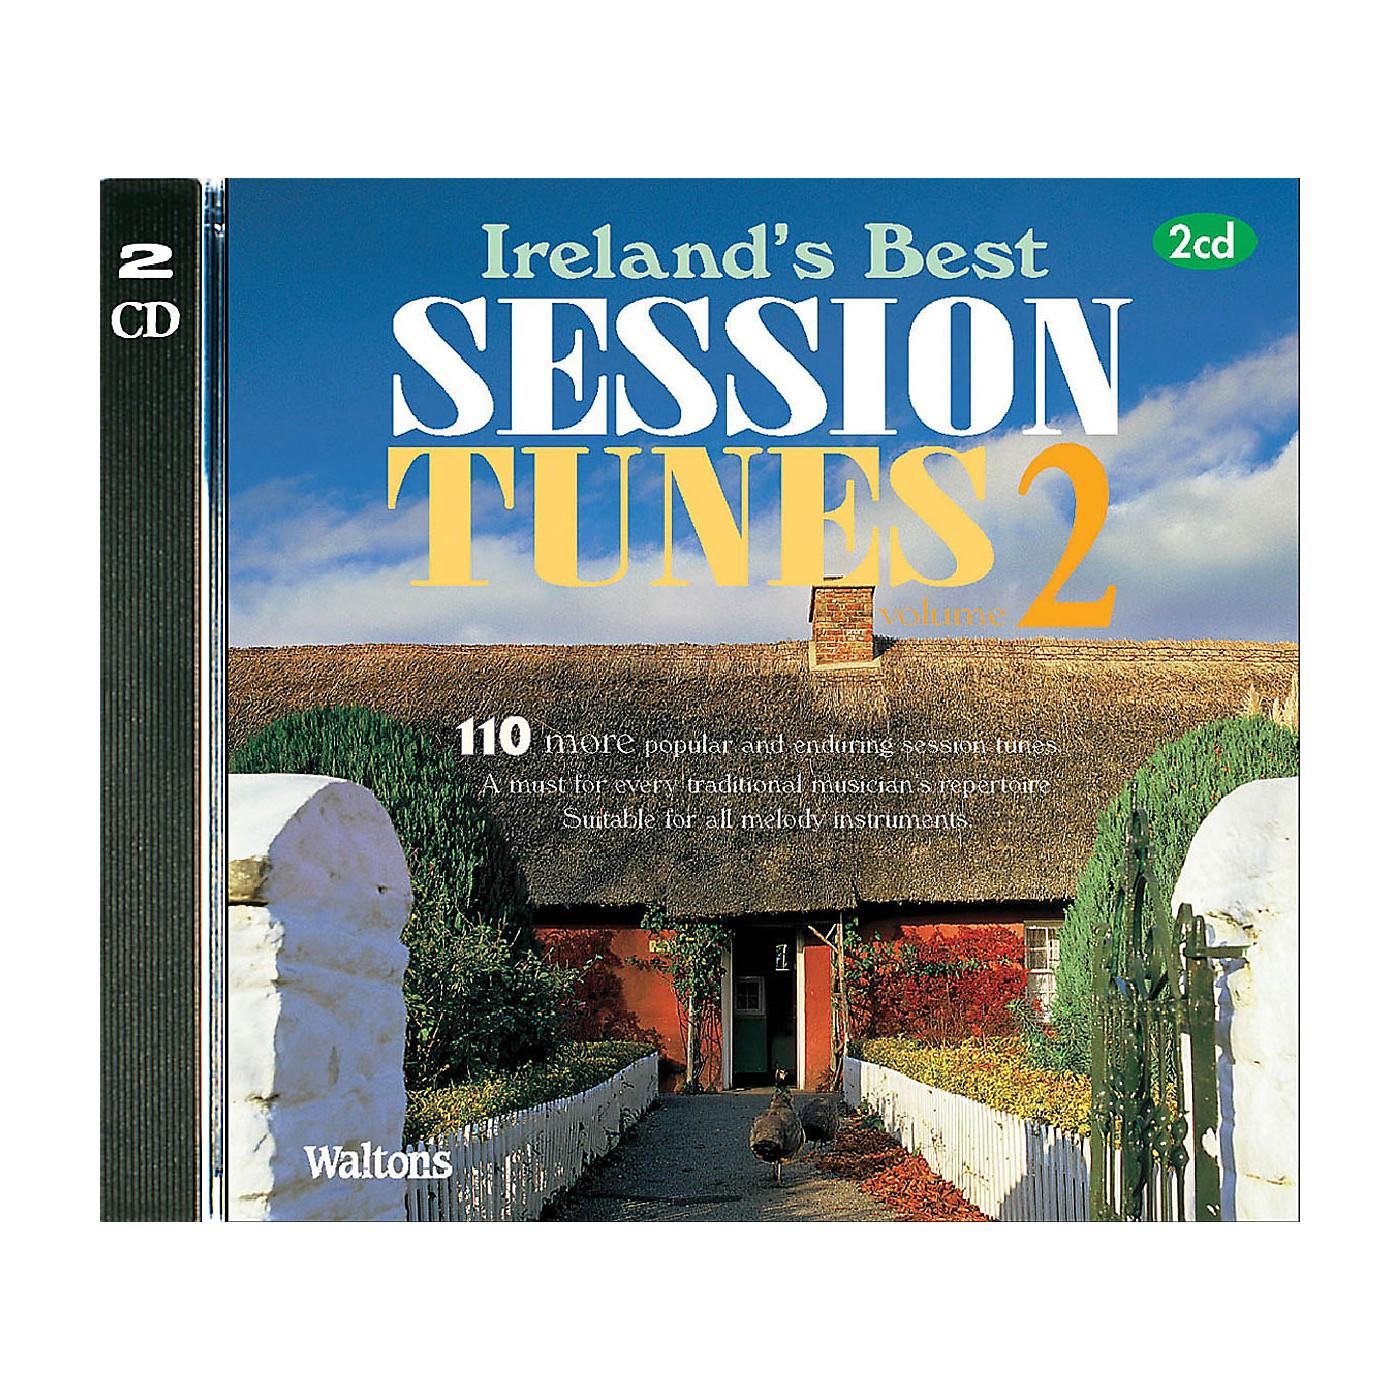 Waltons 110 Ireland's Best Session Tunes - Volume 2 (with Guitar Chords) Waltons Irish Music Books Series CD thumbnail